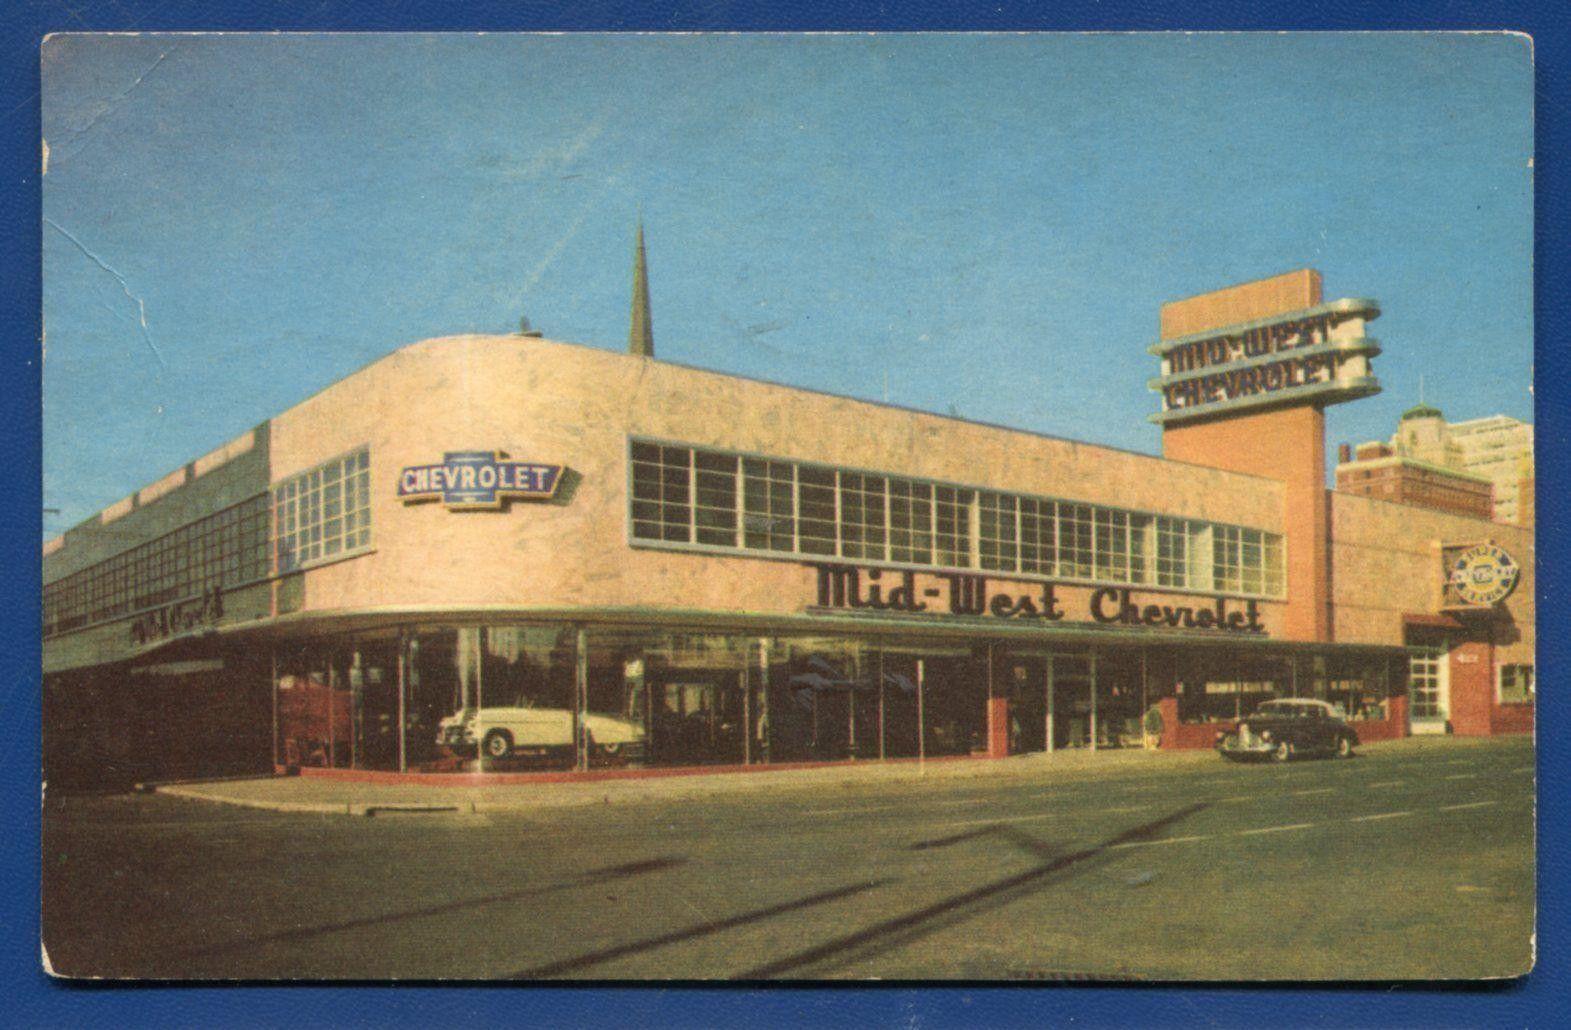 1953 MidWest Chevrolet Dealership, Tulsa, Oklahoma